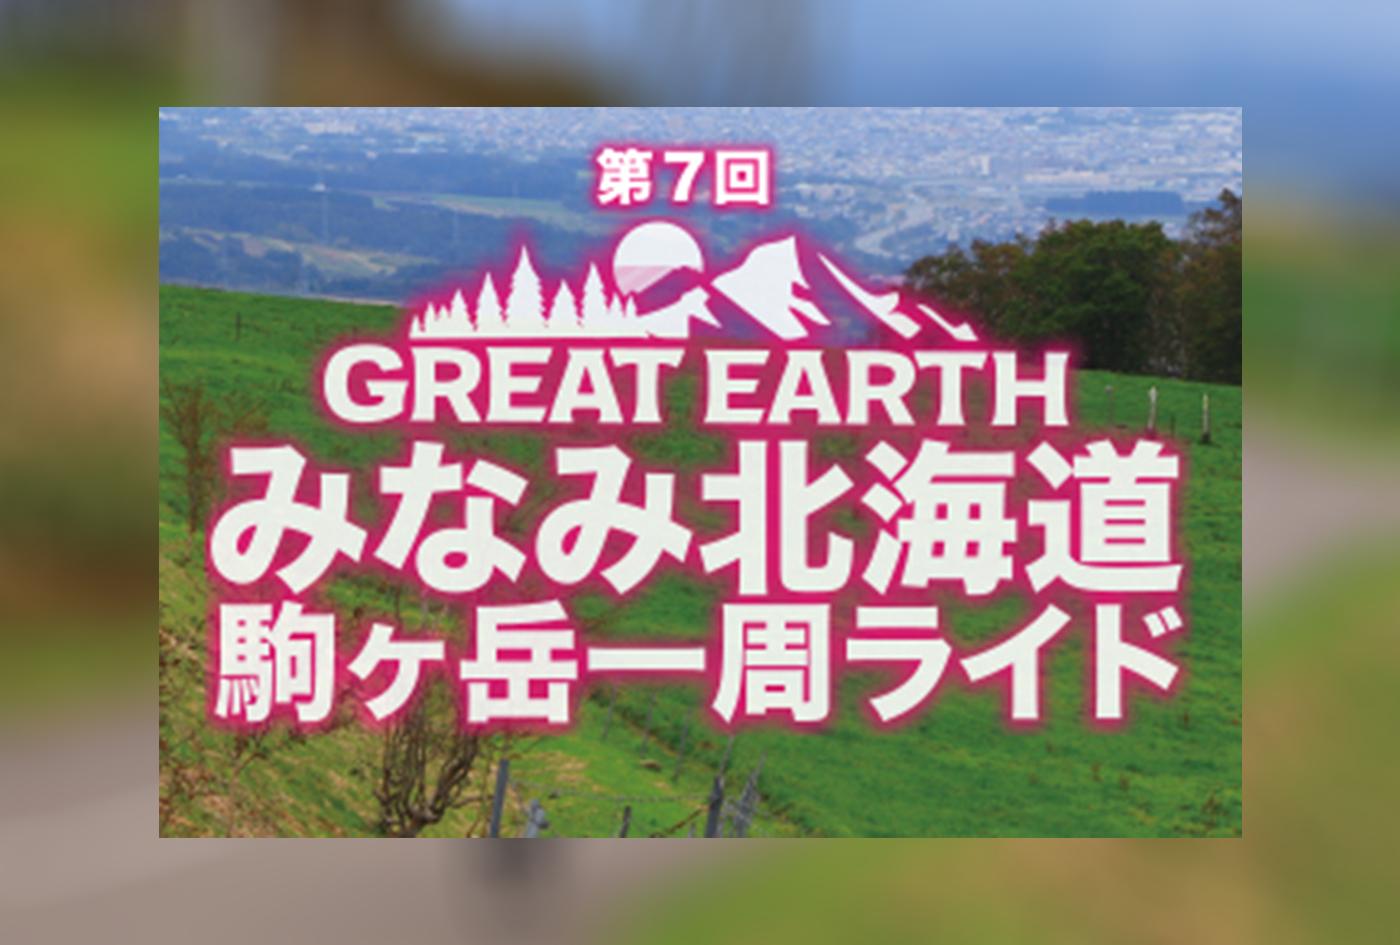 GREAT EARTH 第7回みなみ北海道駒ケ岳一周ライド | 北海道